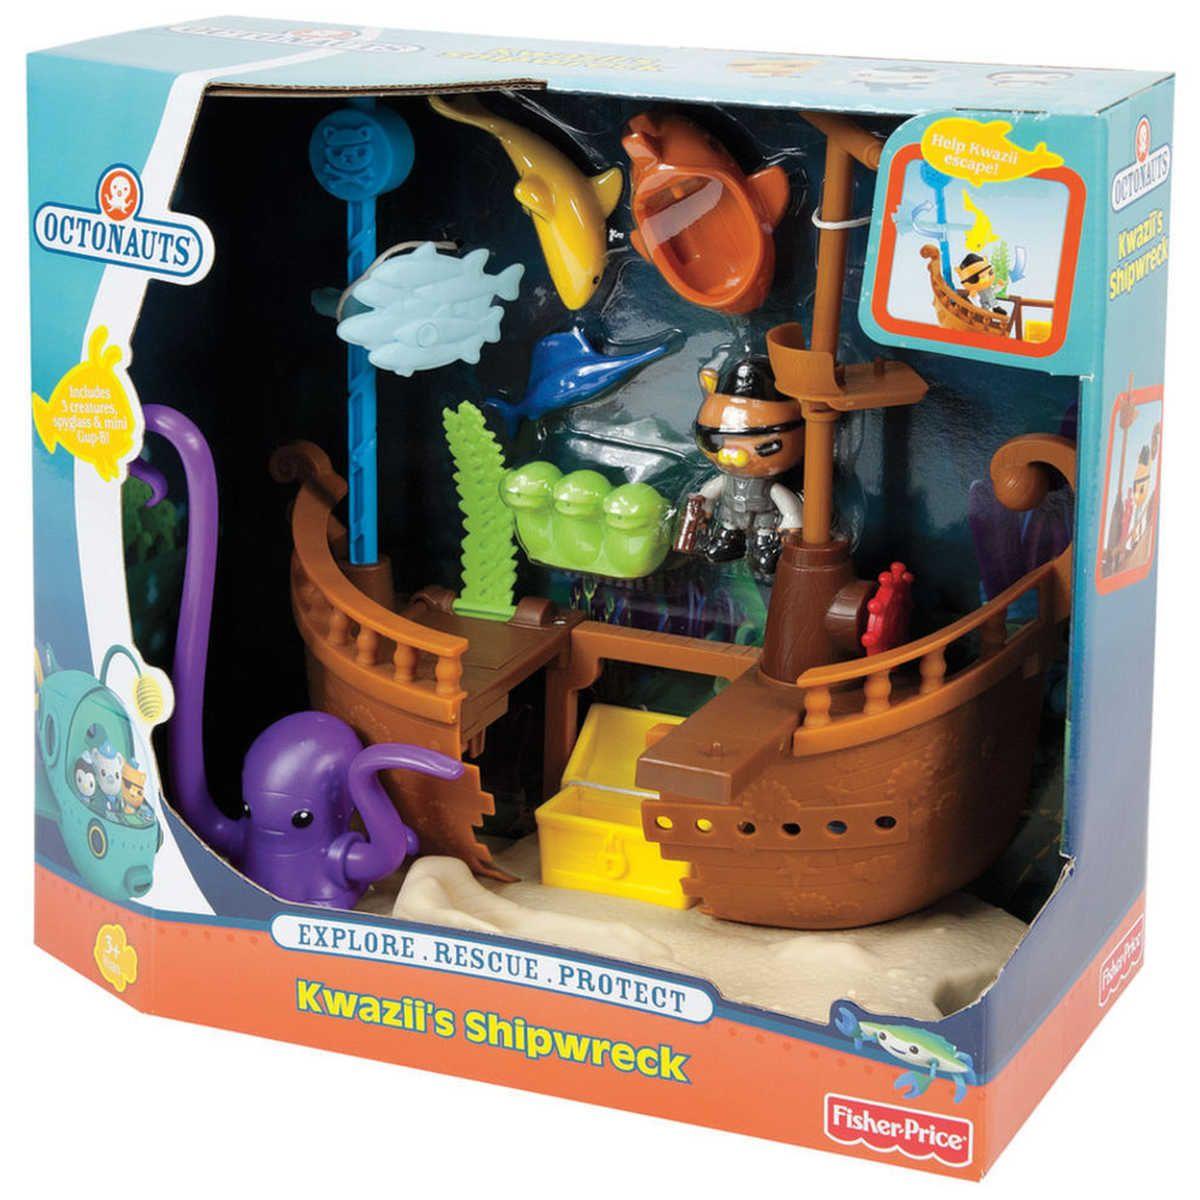 Fisher-price Octonauts Tunip /& The Sea Snot Blob Figure Play Pack